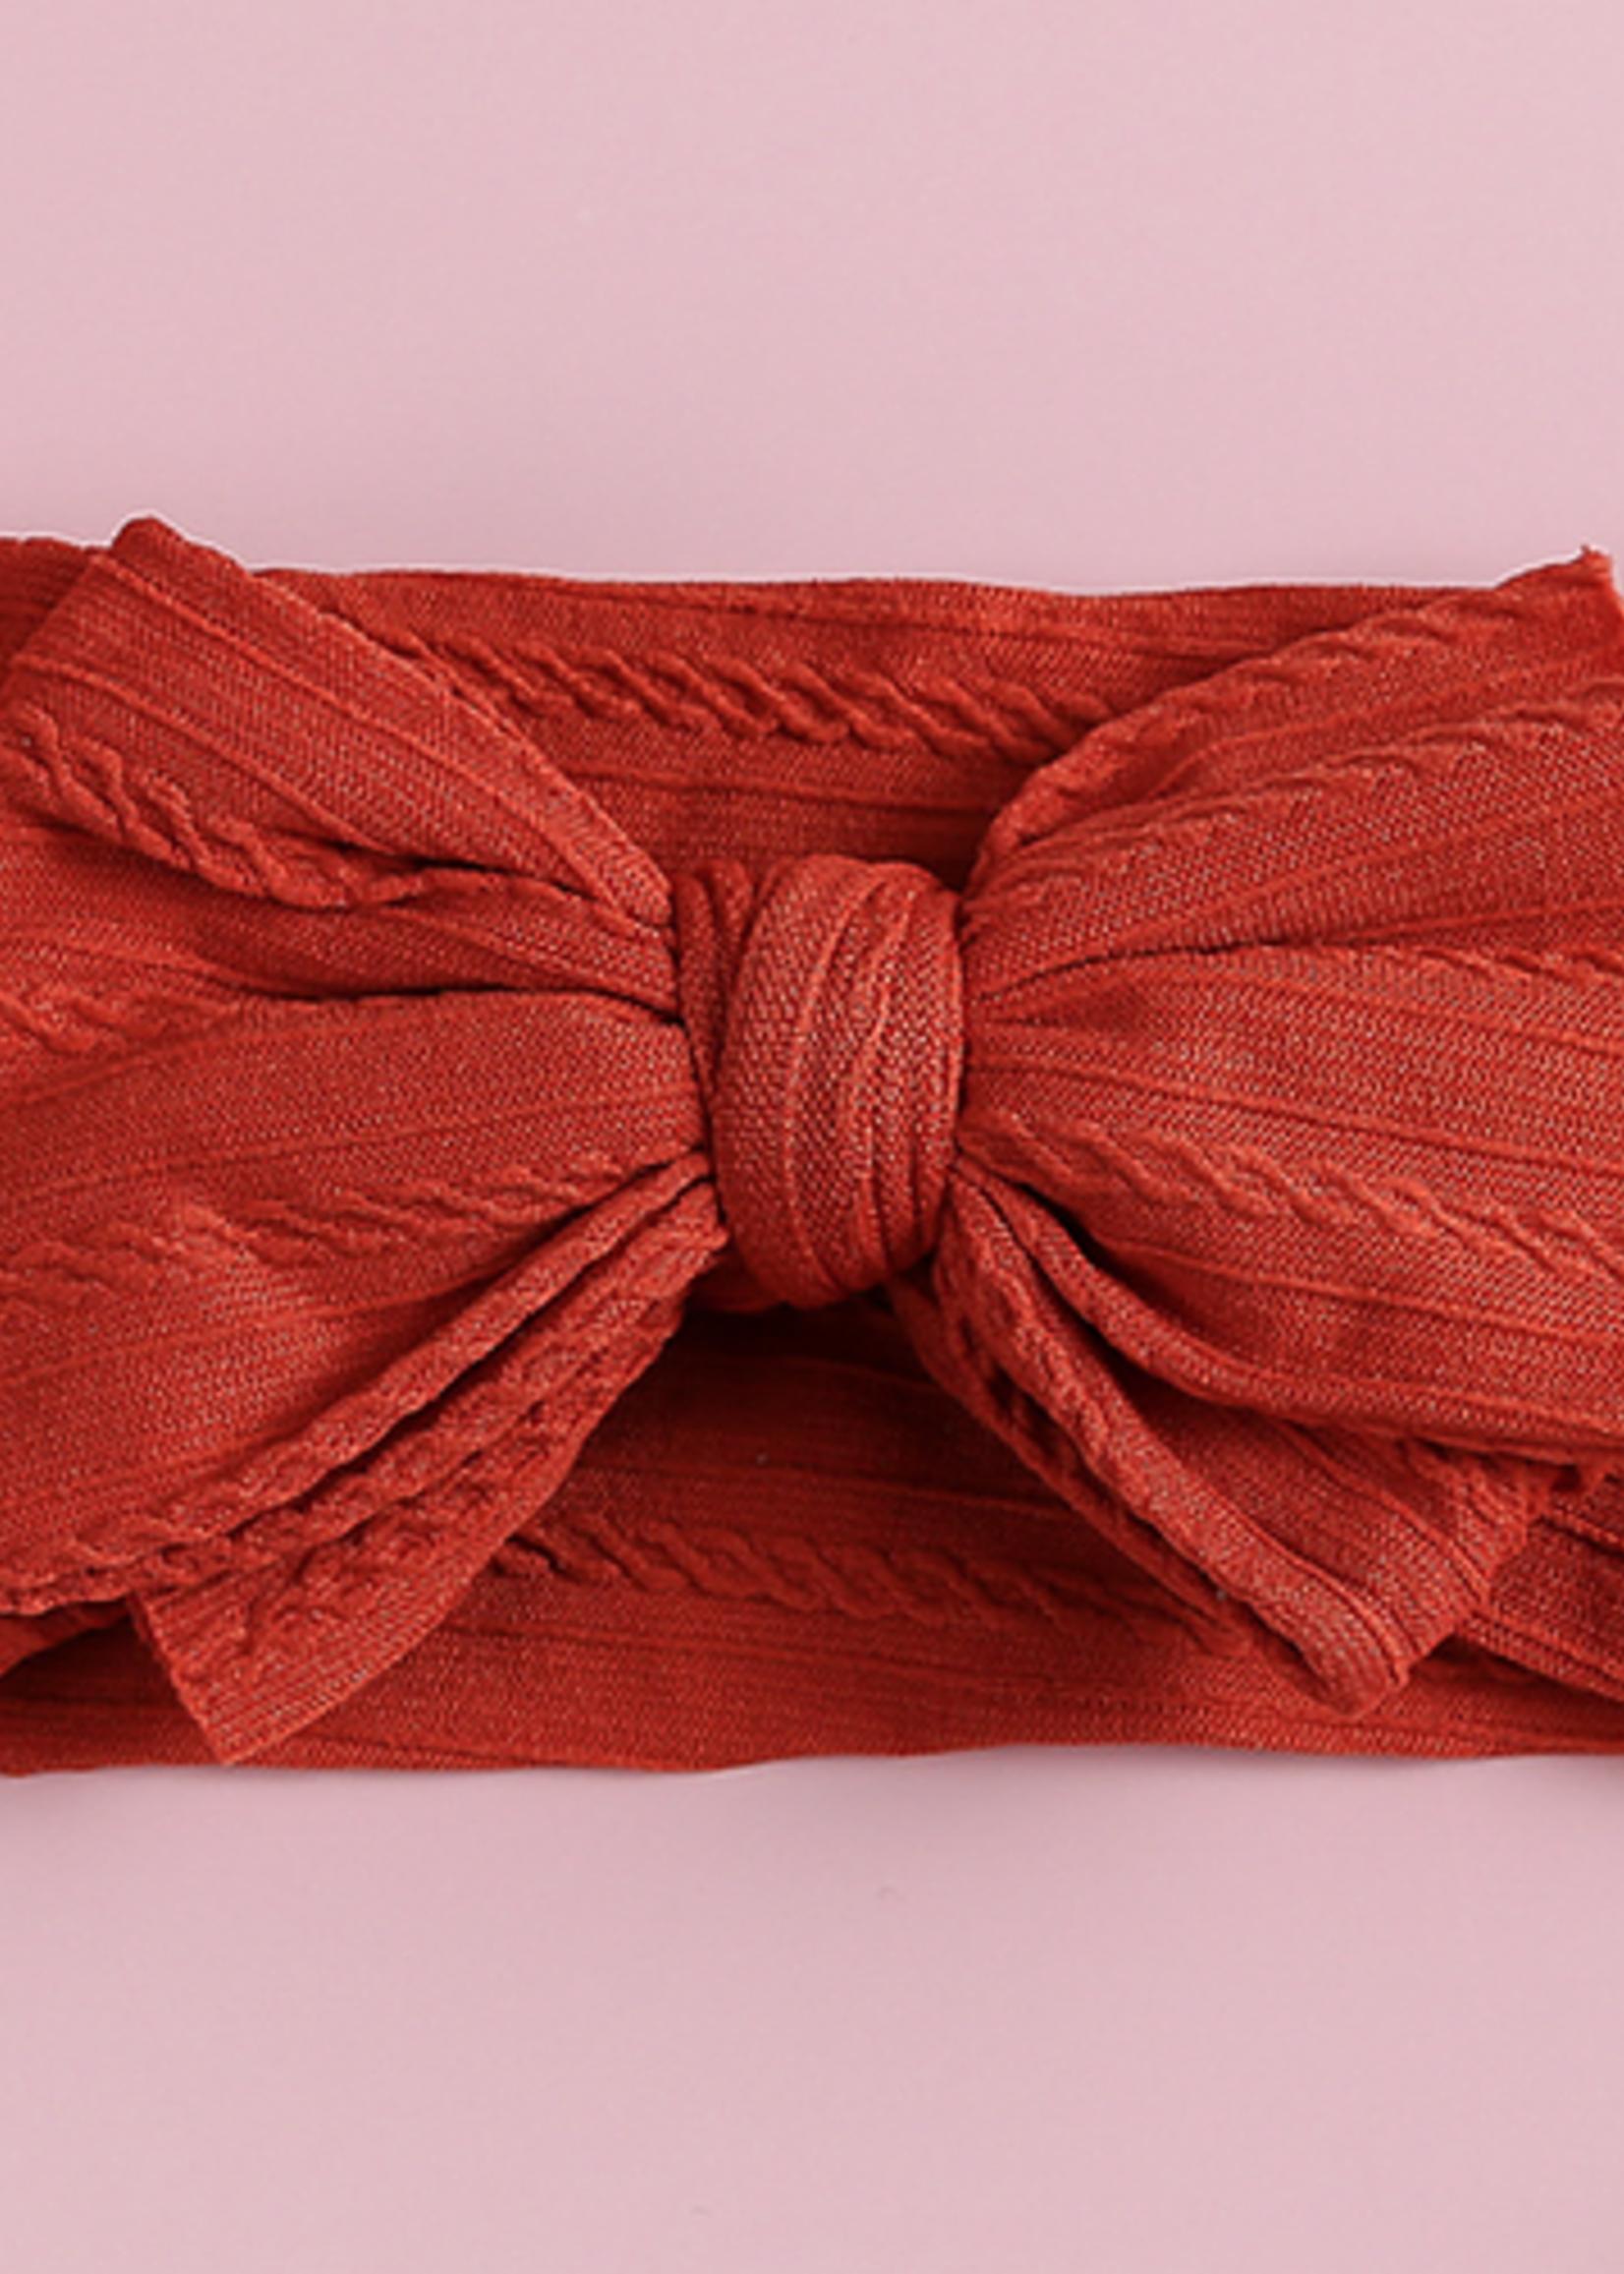 Baby Hood Baby Hood Cable Knit Baby Headband